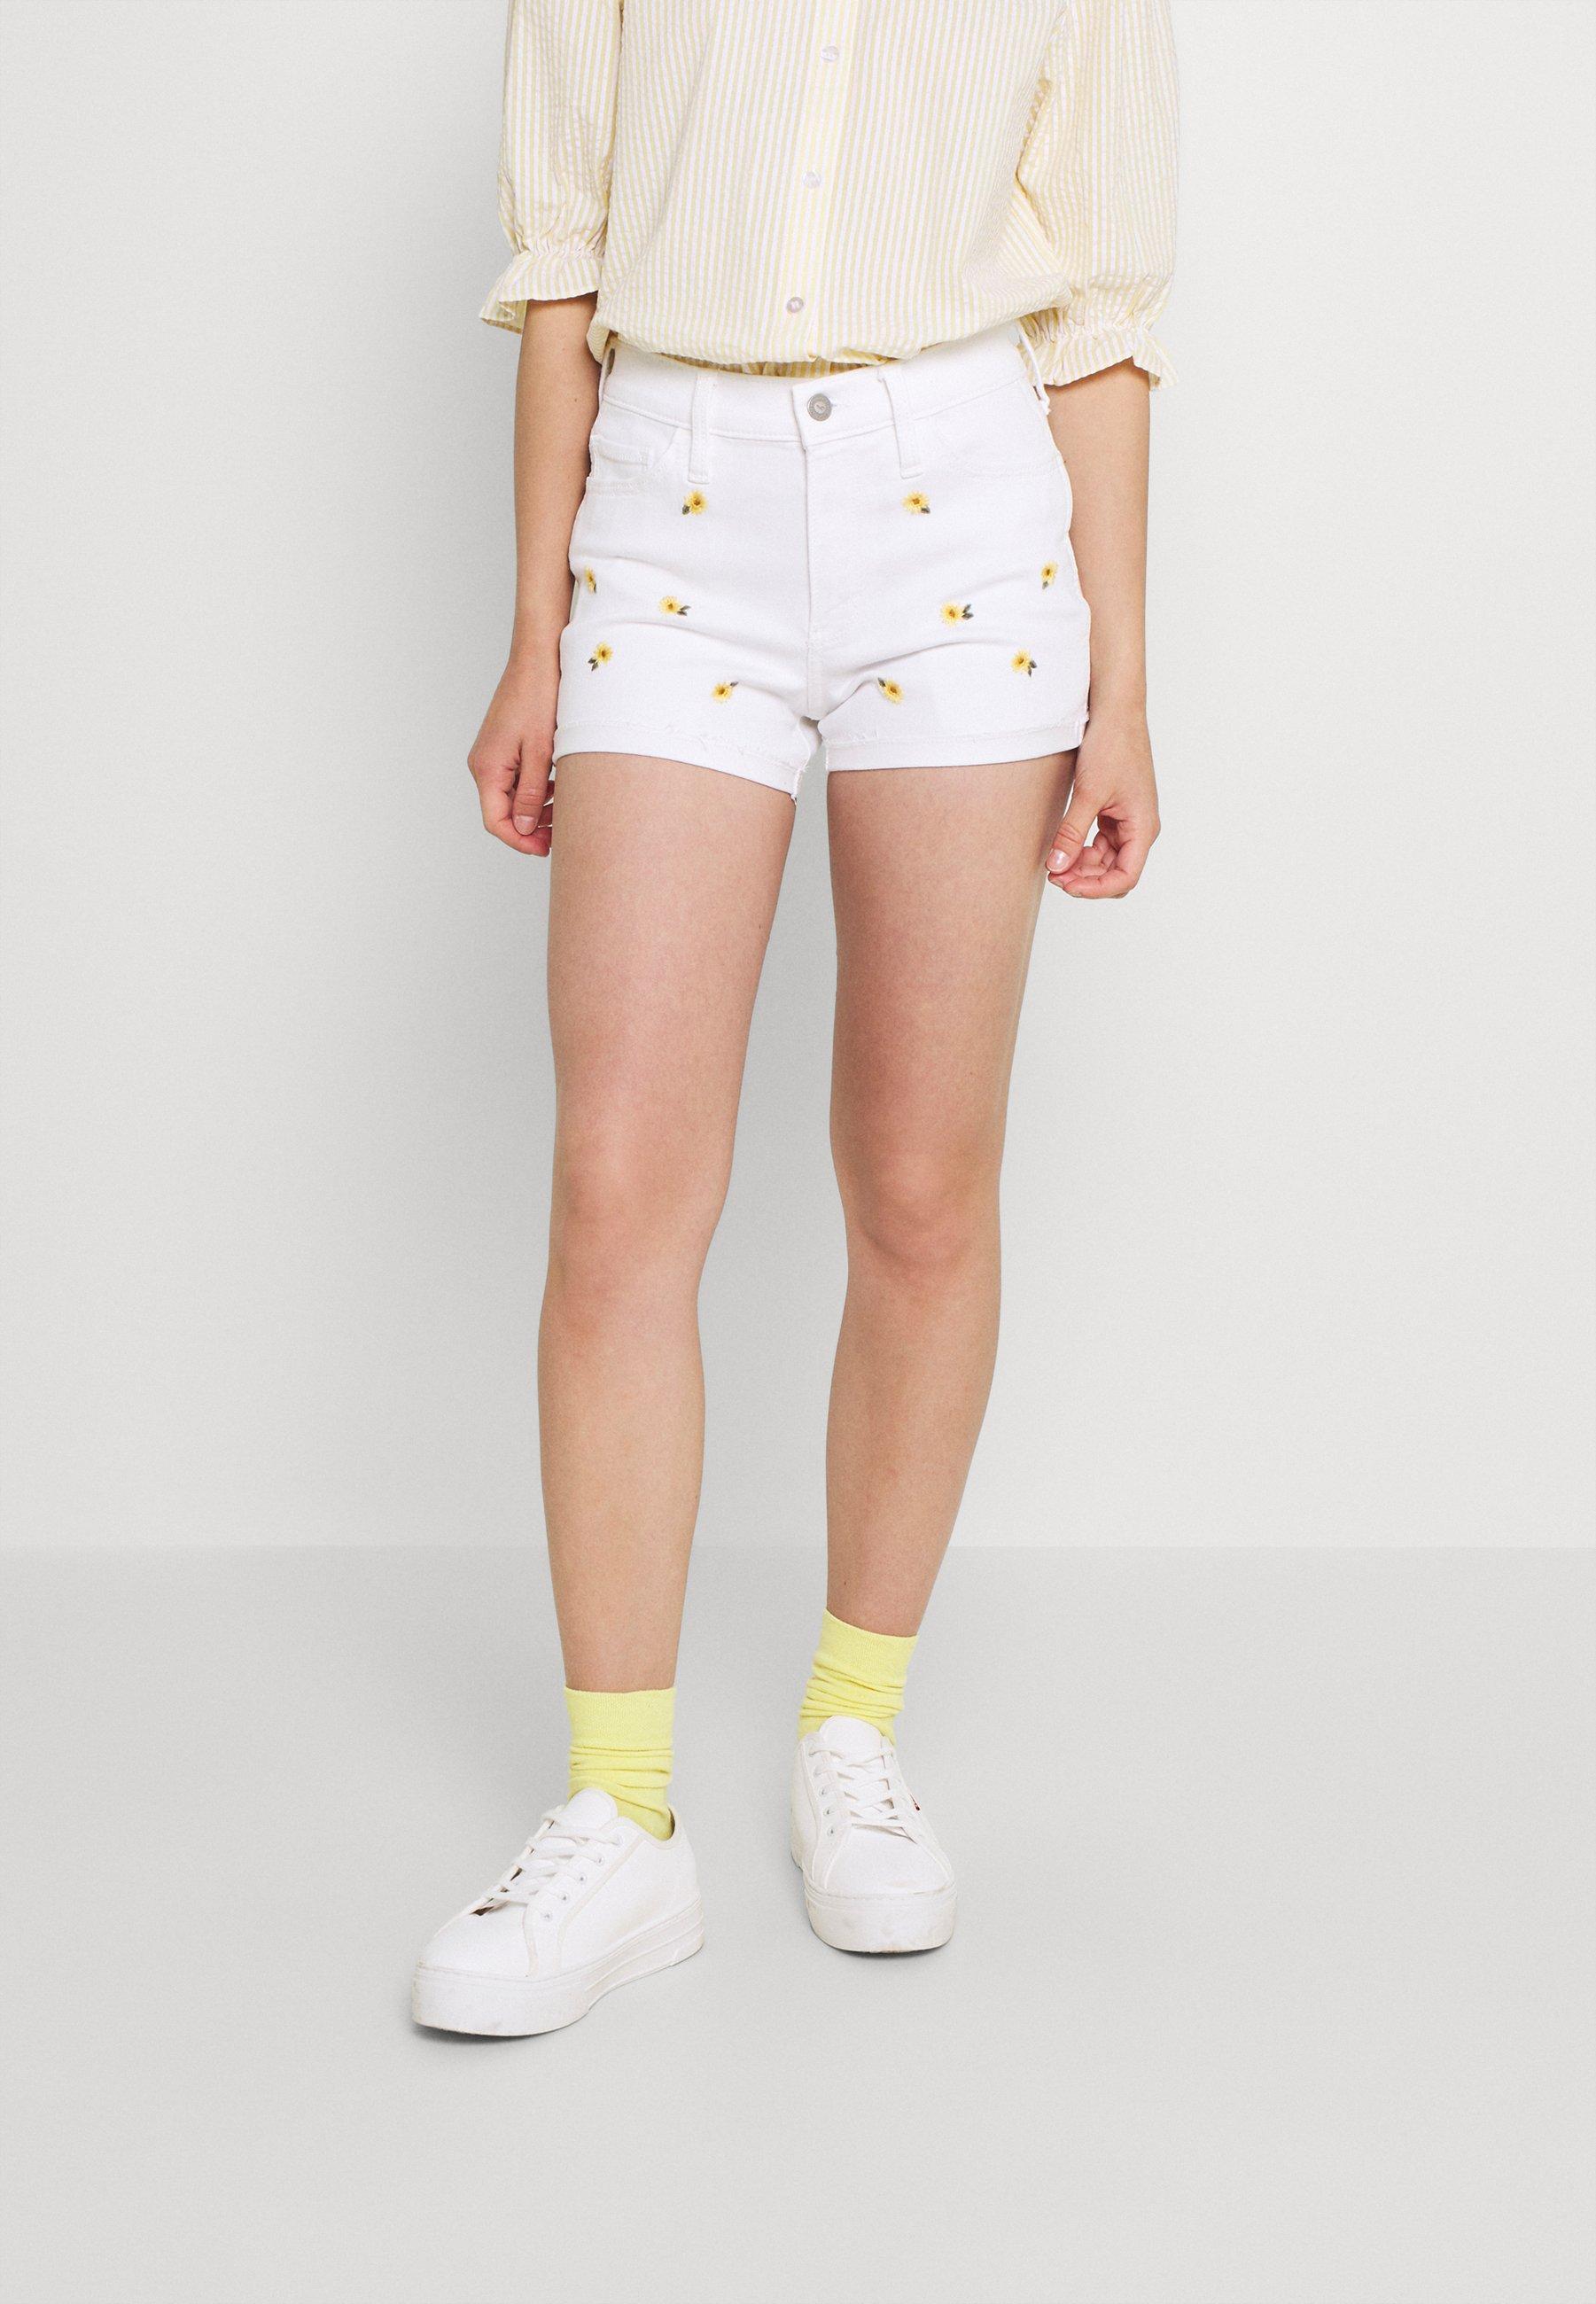 Damer CLEAN DAISY ROLL - Jeans Short / cowboy shorts - white